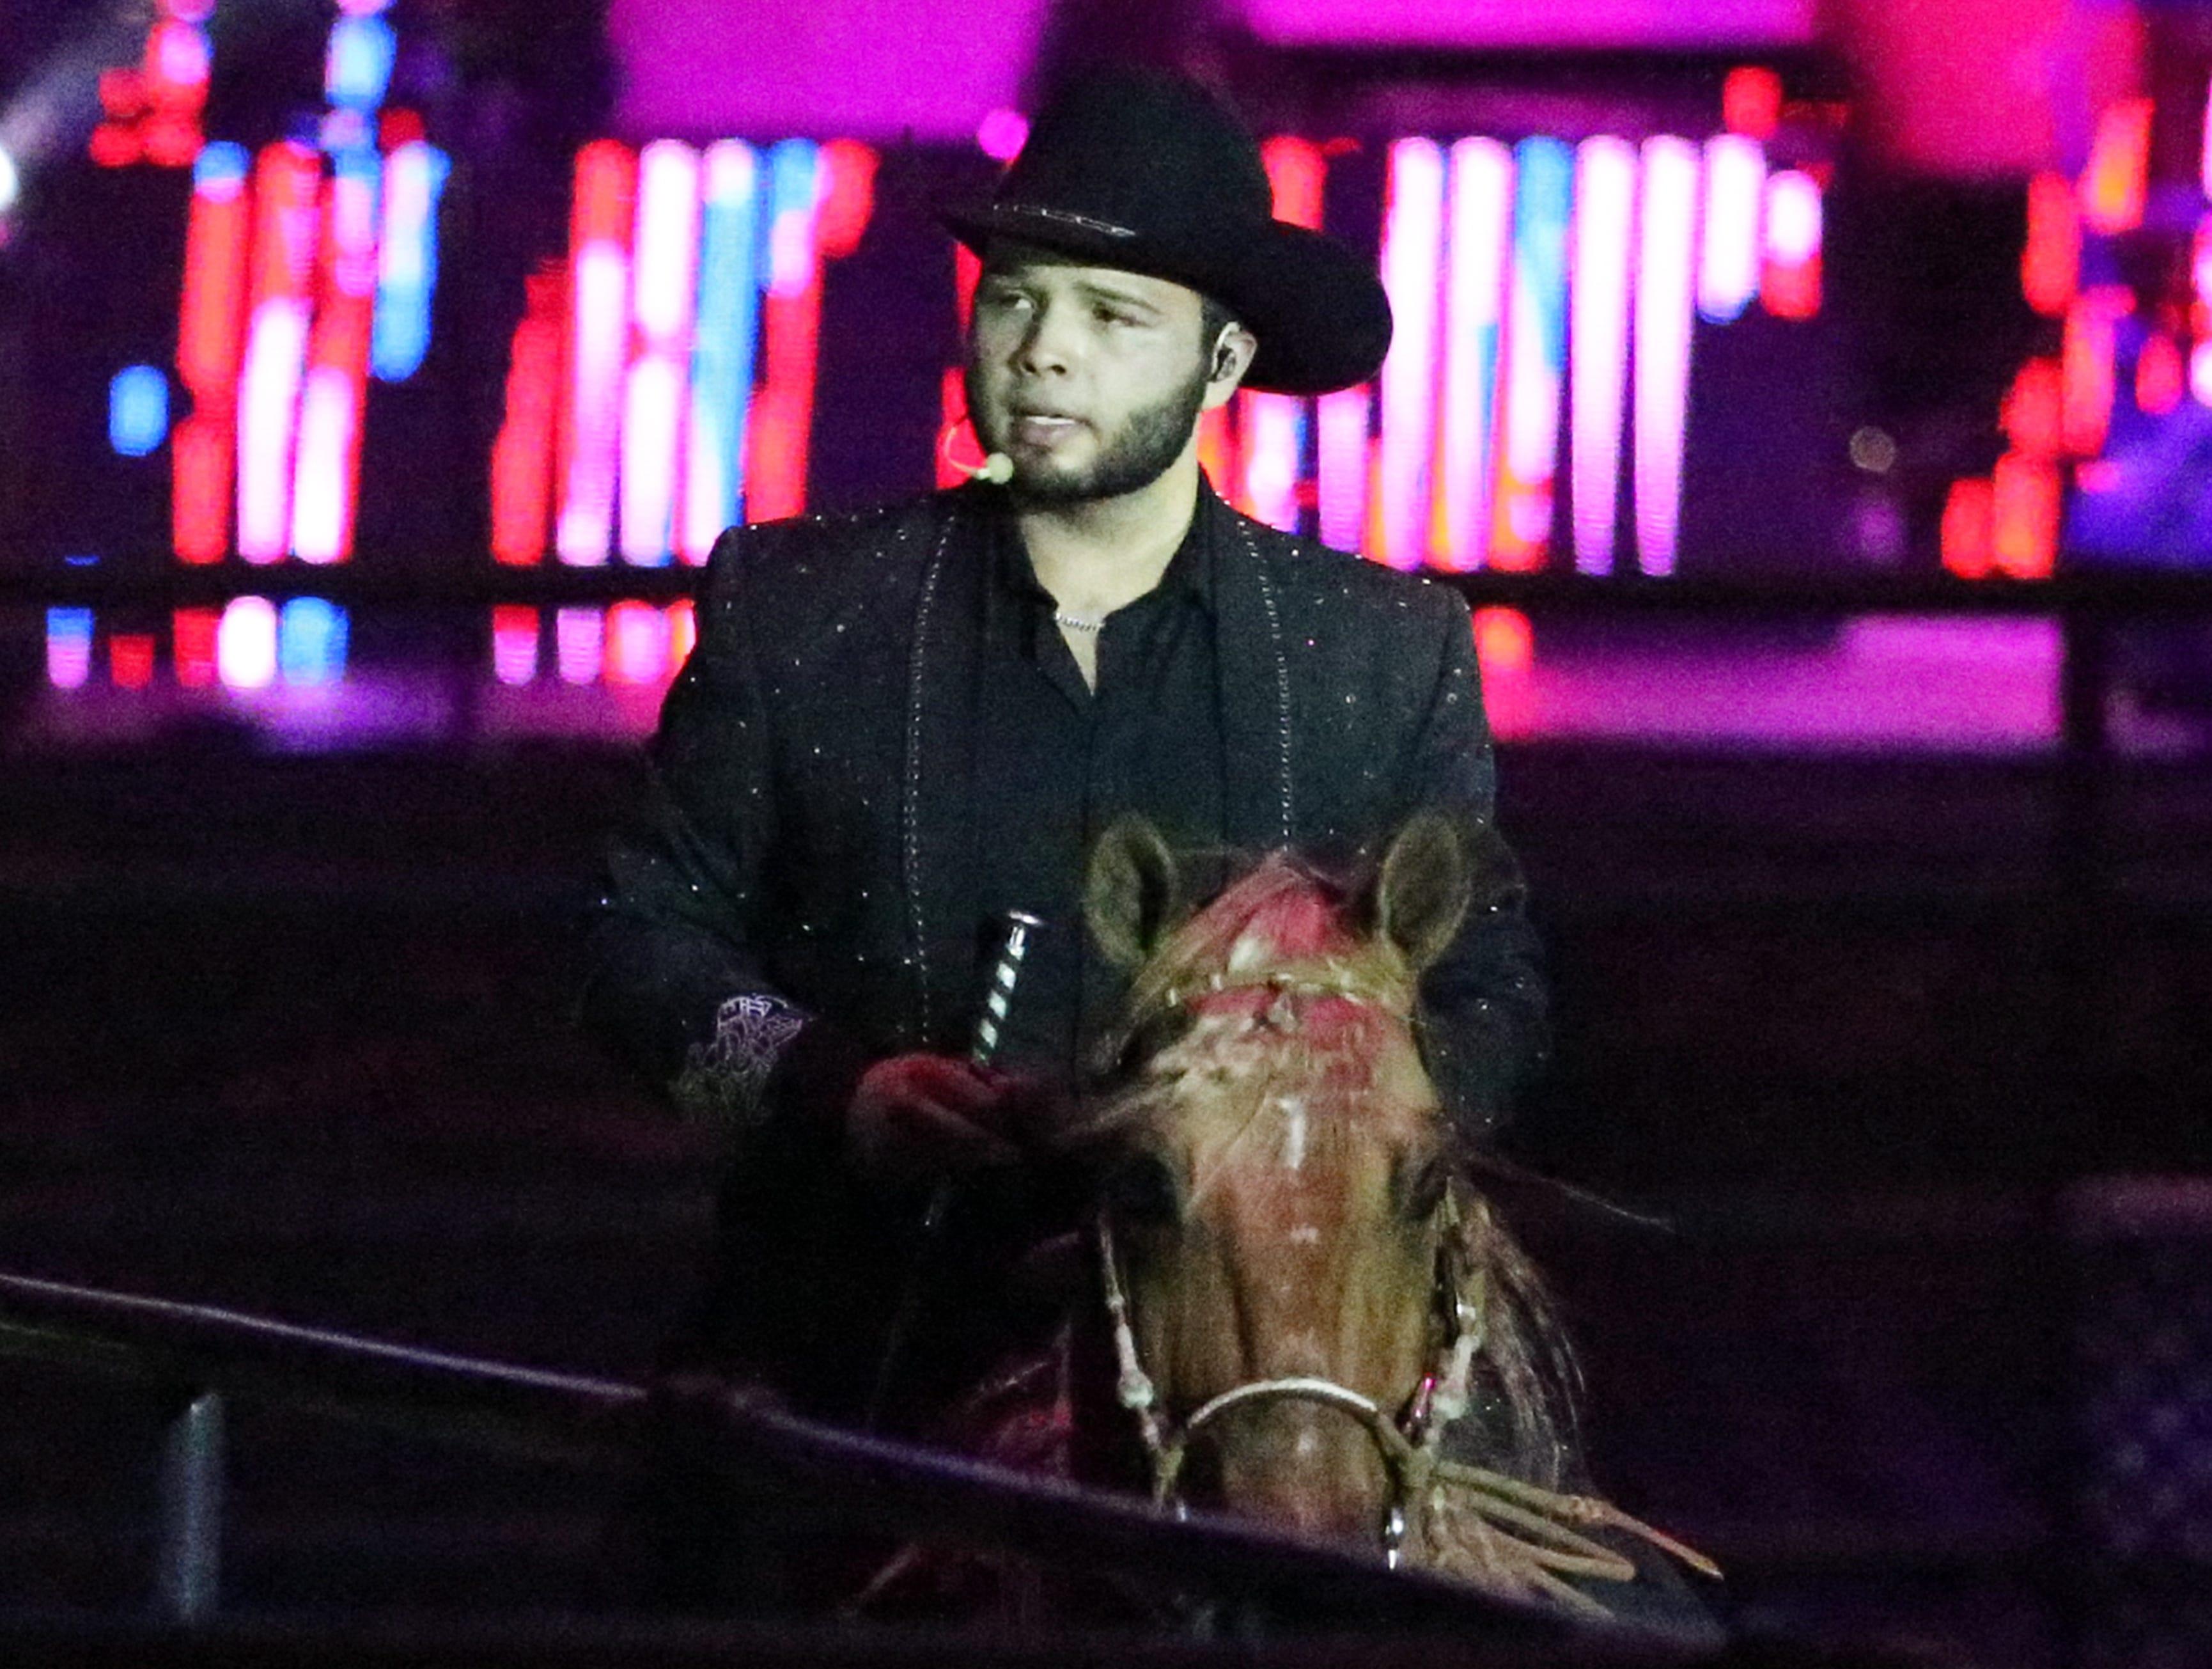 Leonardo Aguilar, 18, started off the 'Jaripeo Sin Fronteras' show Saturday night in the El Paso County Coliseum.